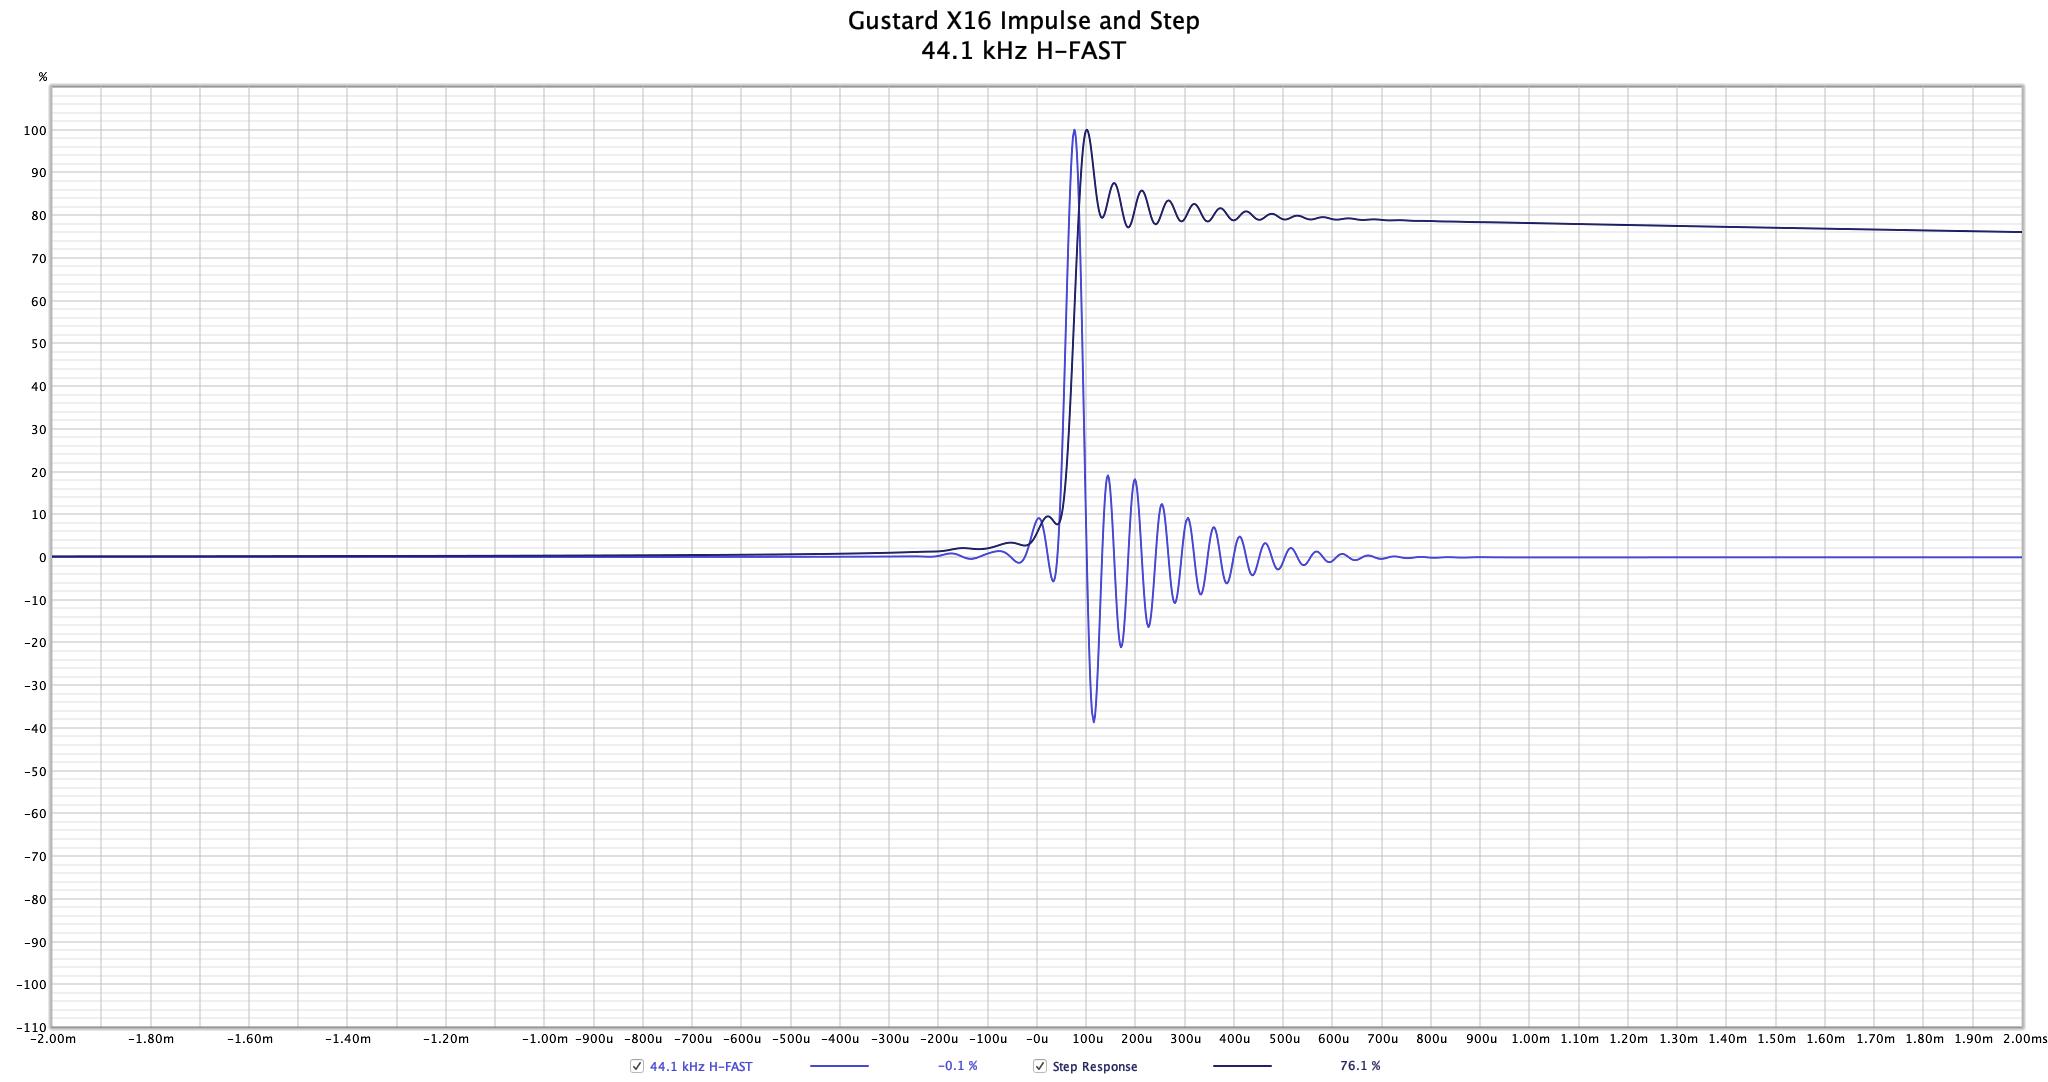 Gustard X16 - 44.1 kHz H-FAST Impulse.png